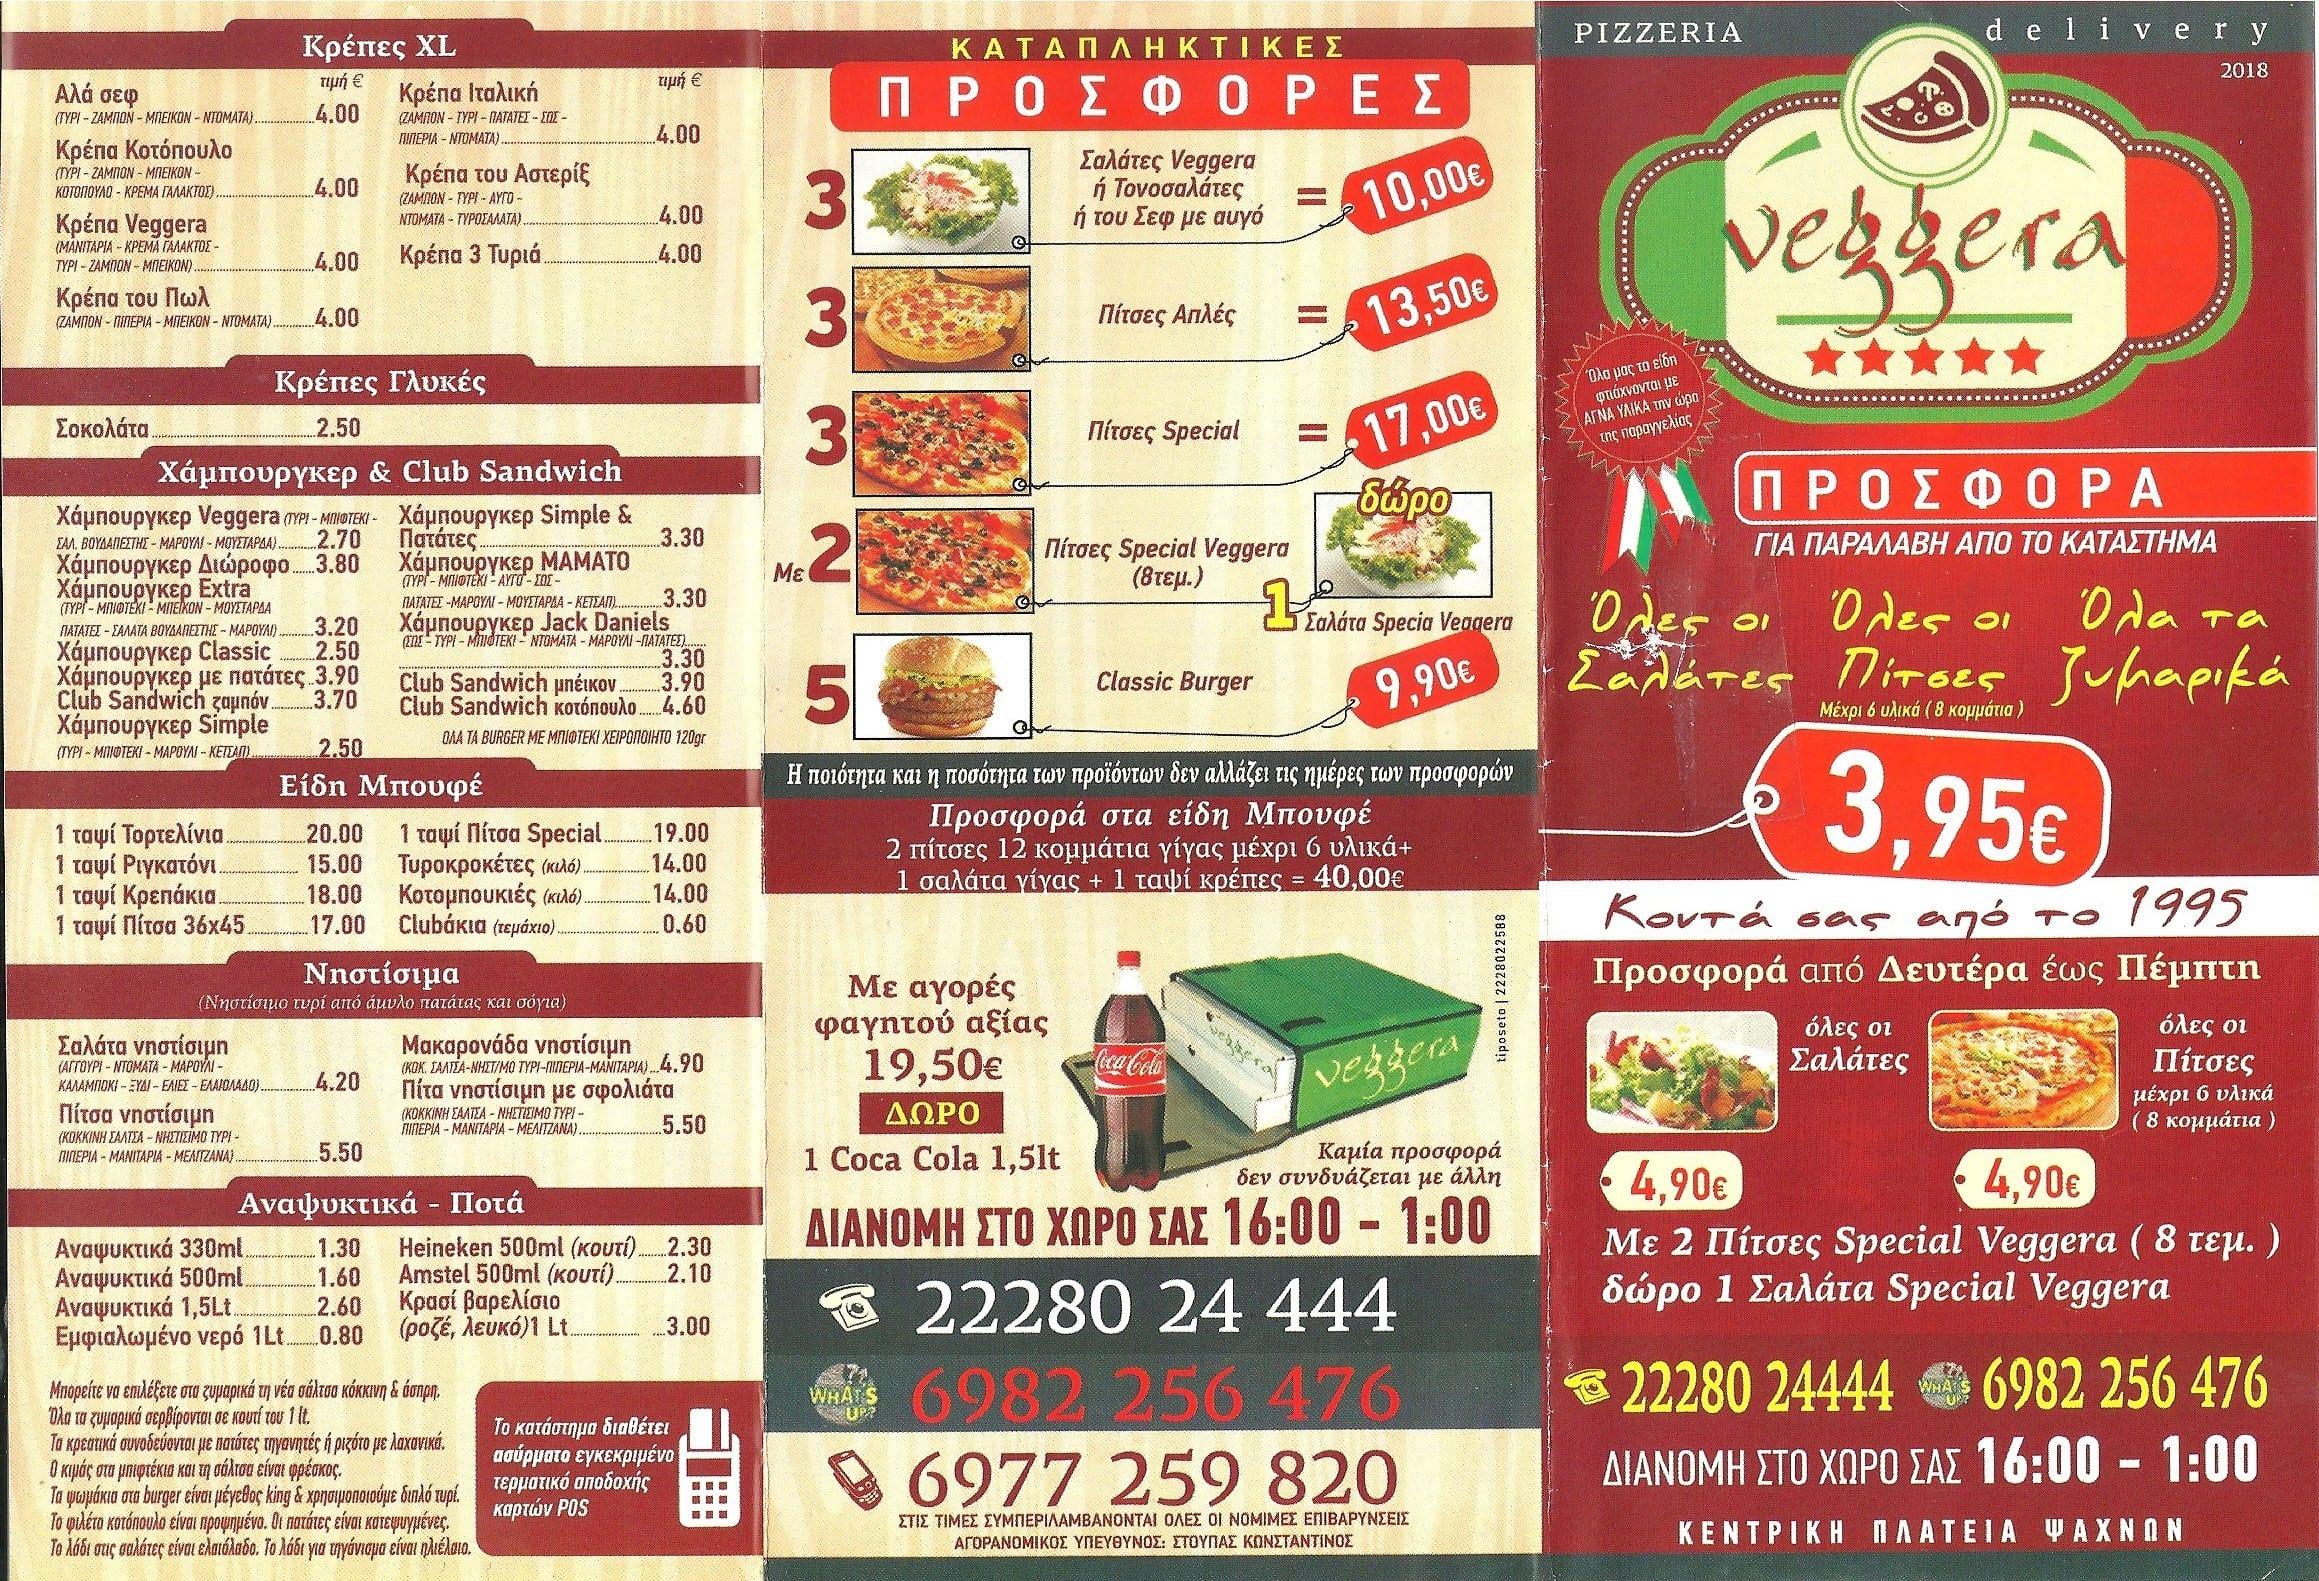 Pizzeria Veggera Ψαχνά Pizzeria Veggera Ψαχνά veggera2